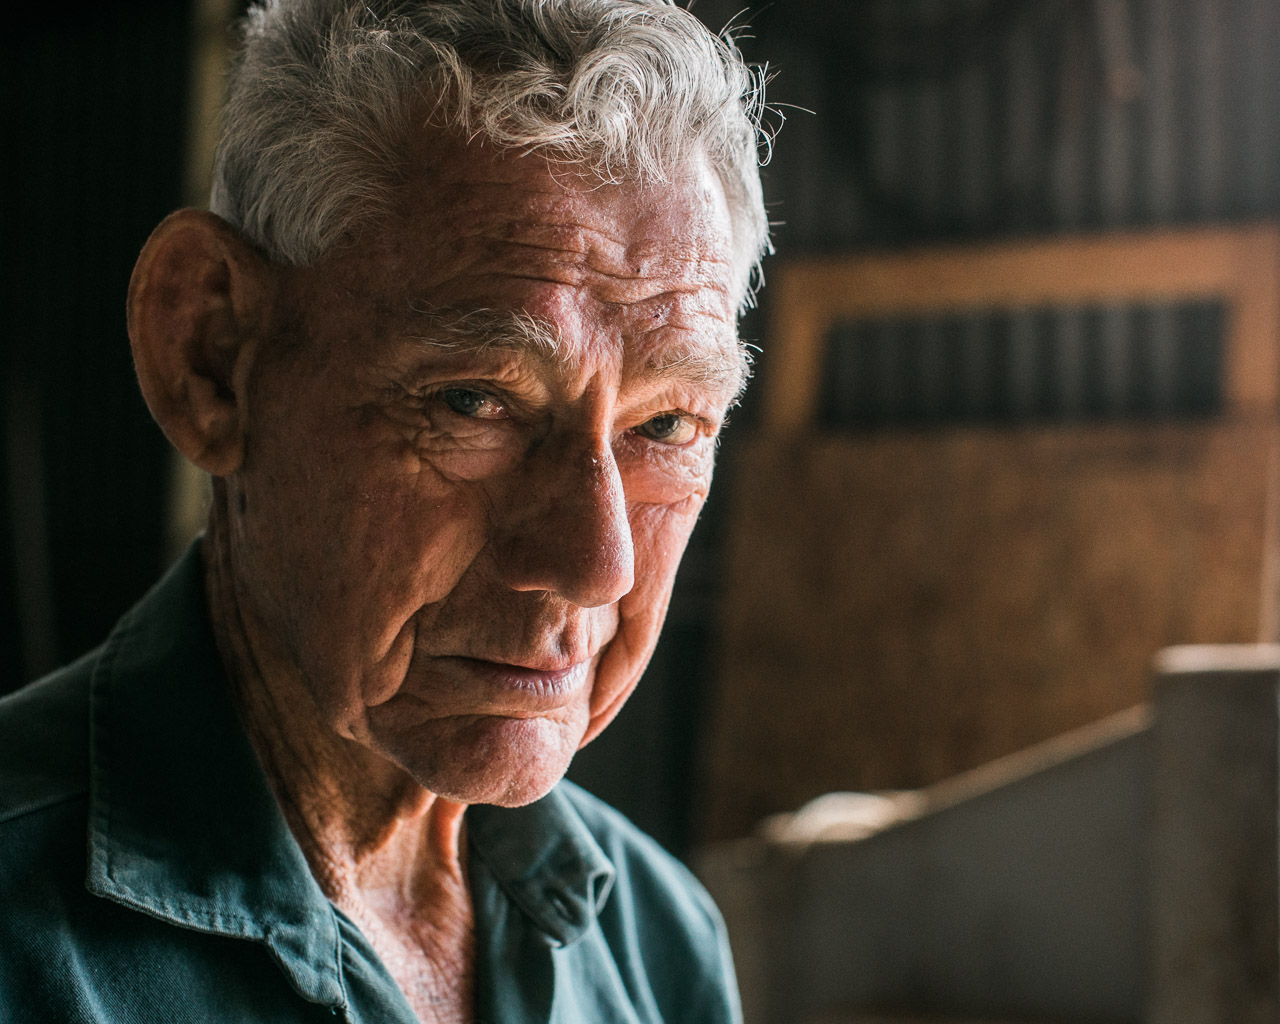 Mukinbudin's mechanic, Richard Spark, aged 82 and living life well